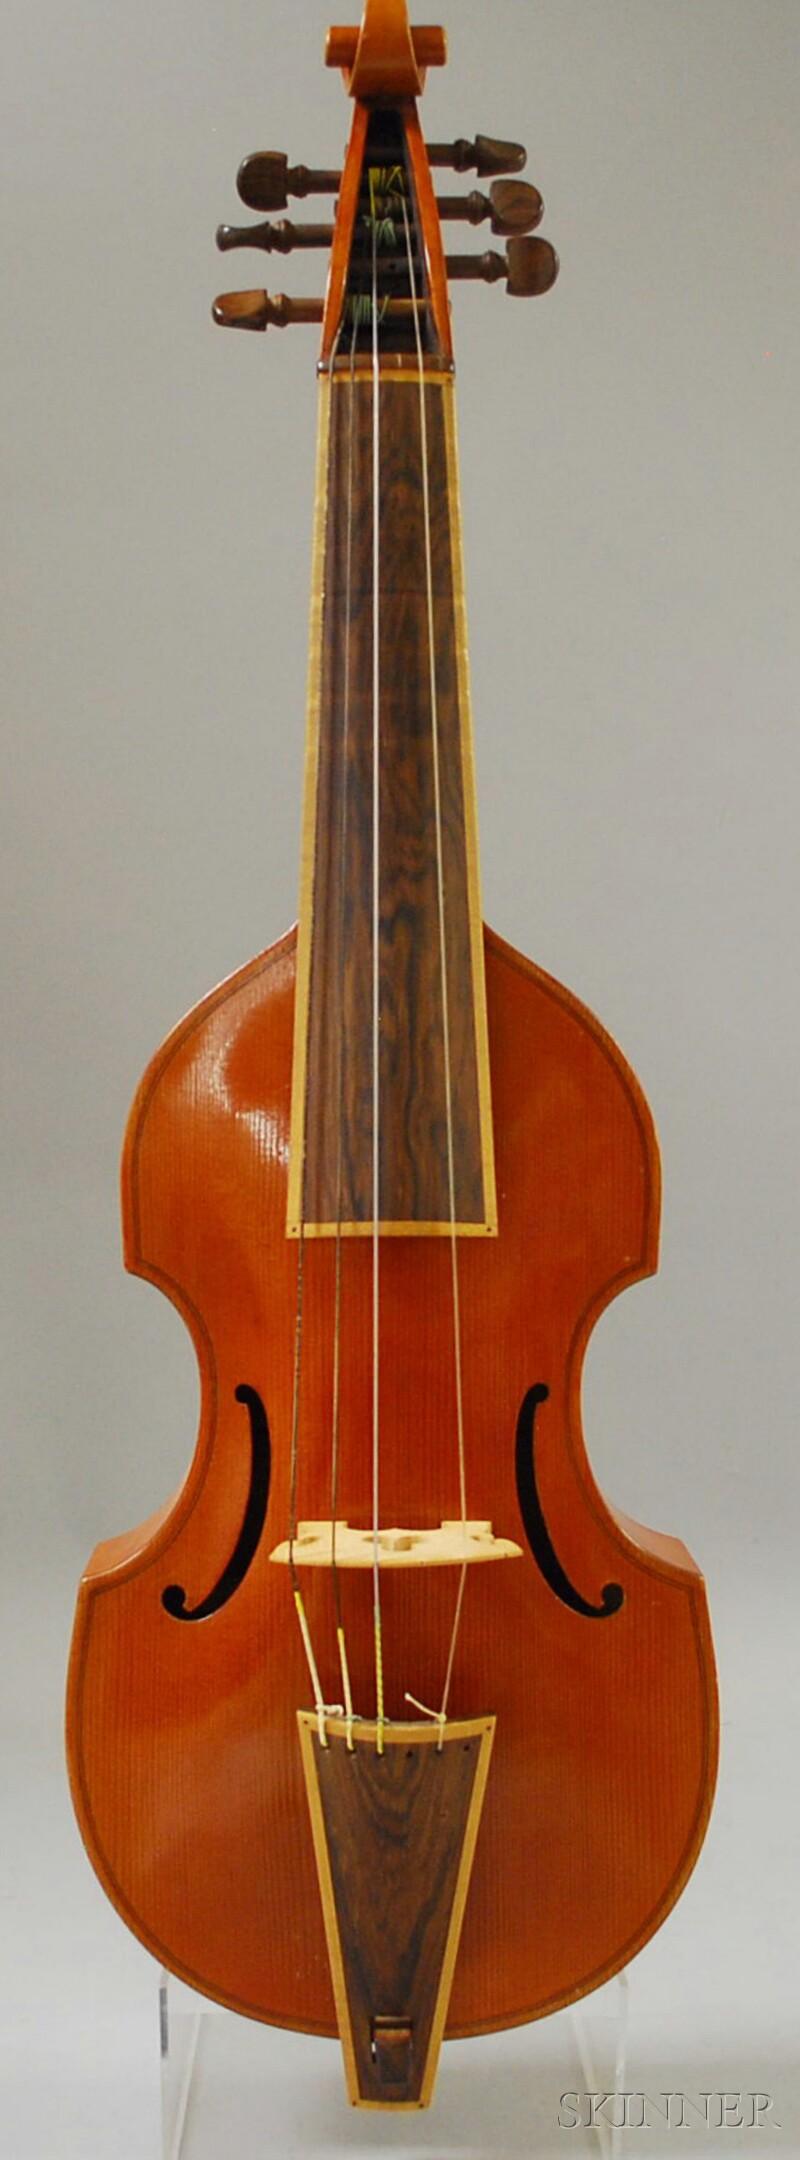 Modern Viola da Gamba, probably Mittenwald, c. 1960